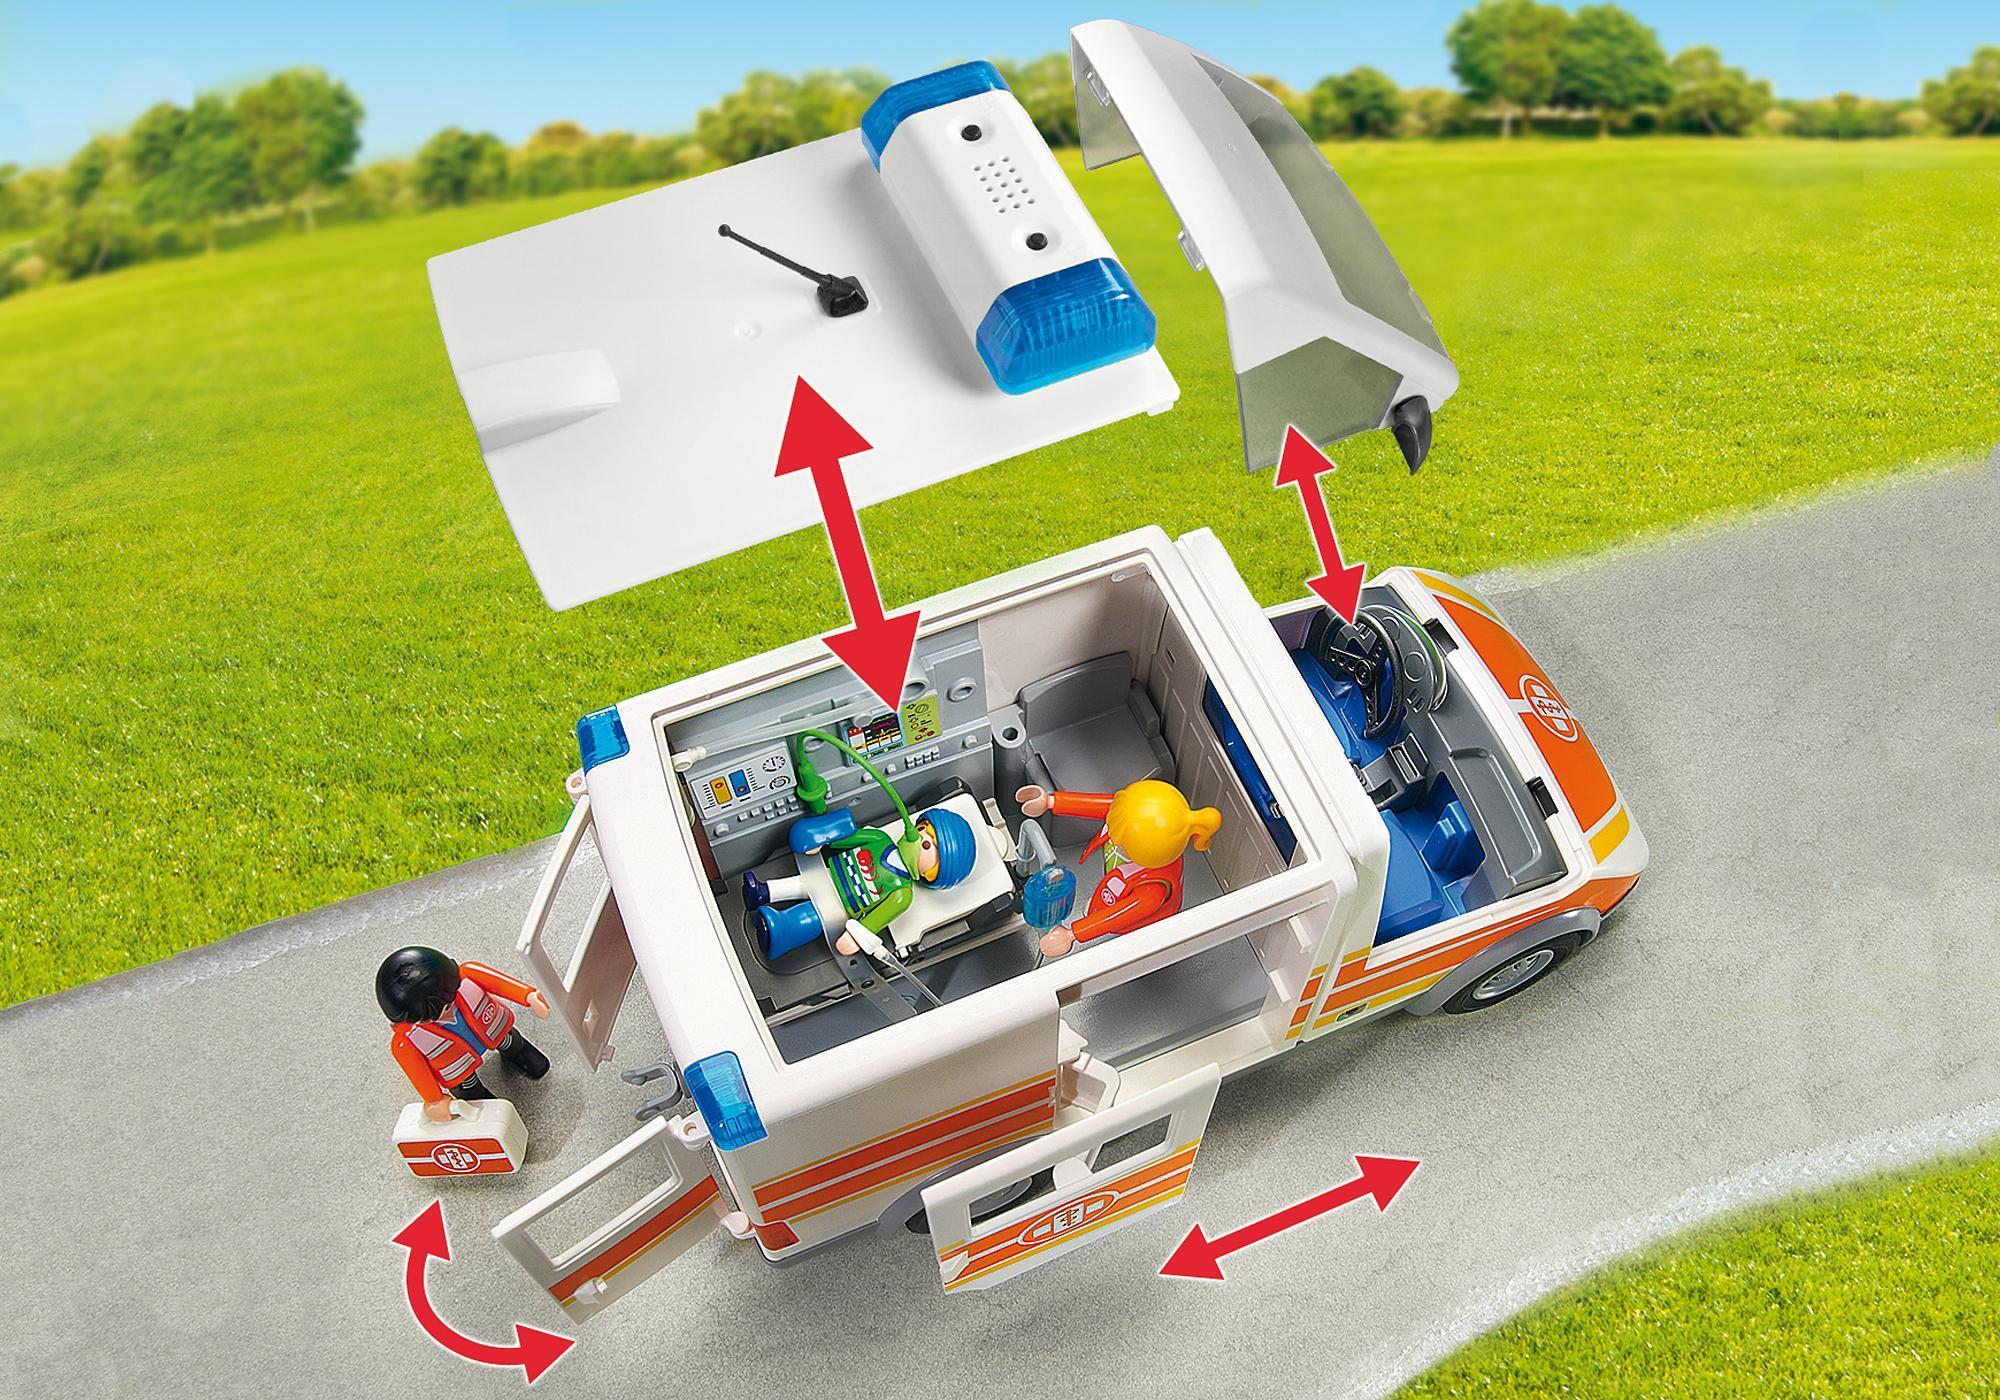 http://media.playmobil.com/i/playmobil/6685_product_extra3/Ambulance avec gyrophare et sirène